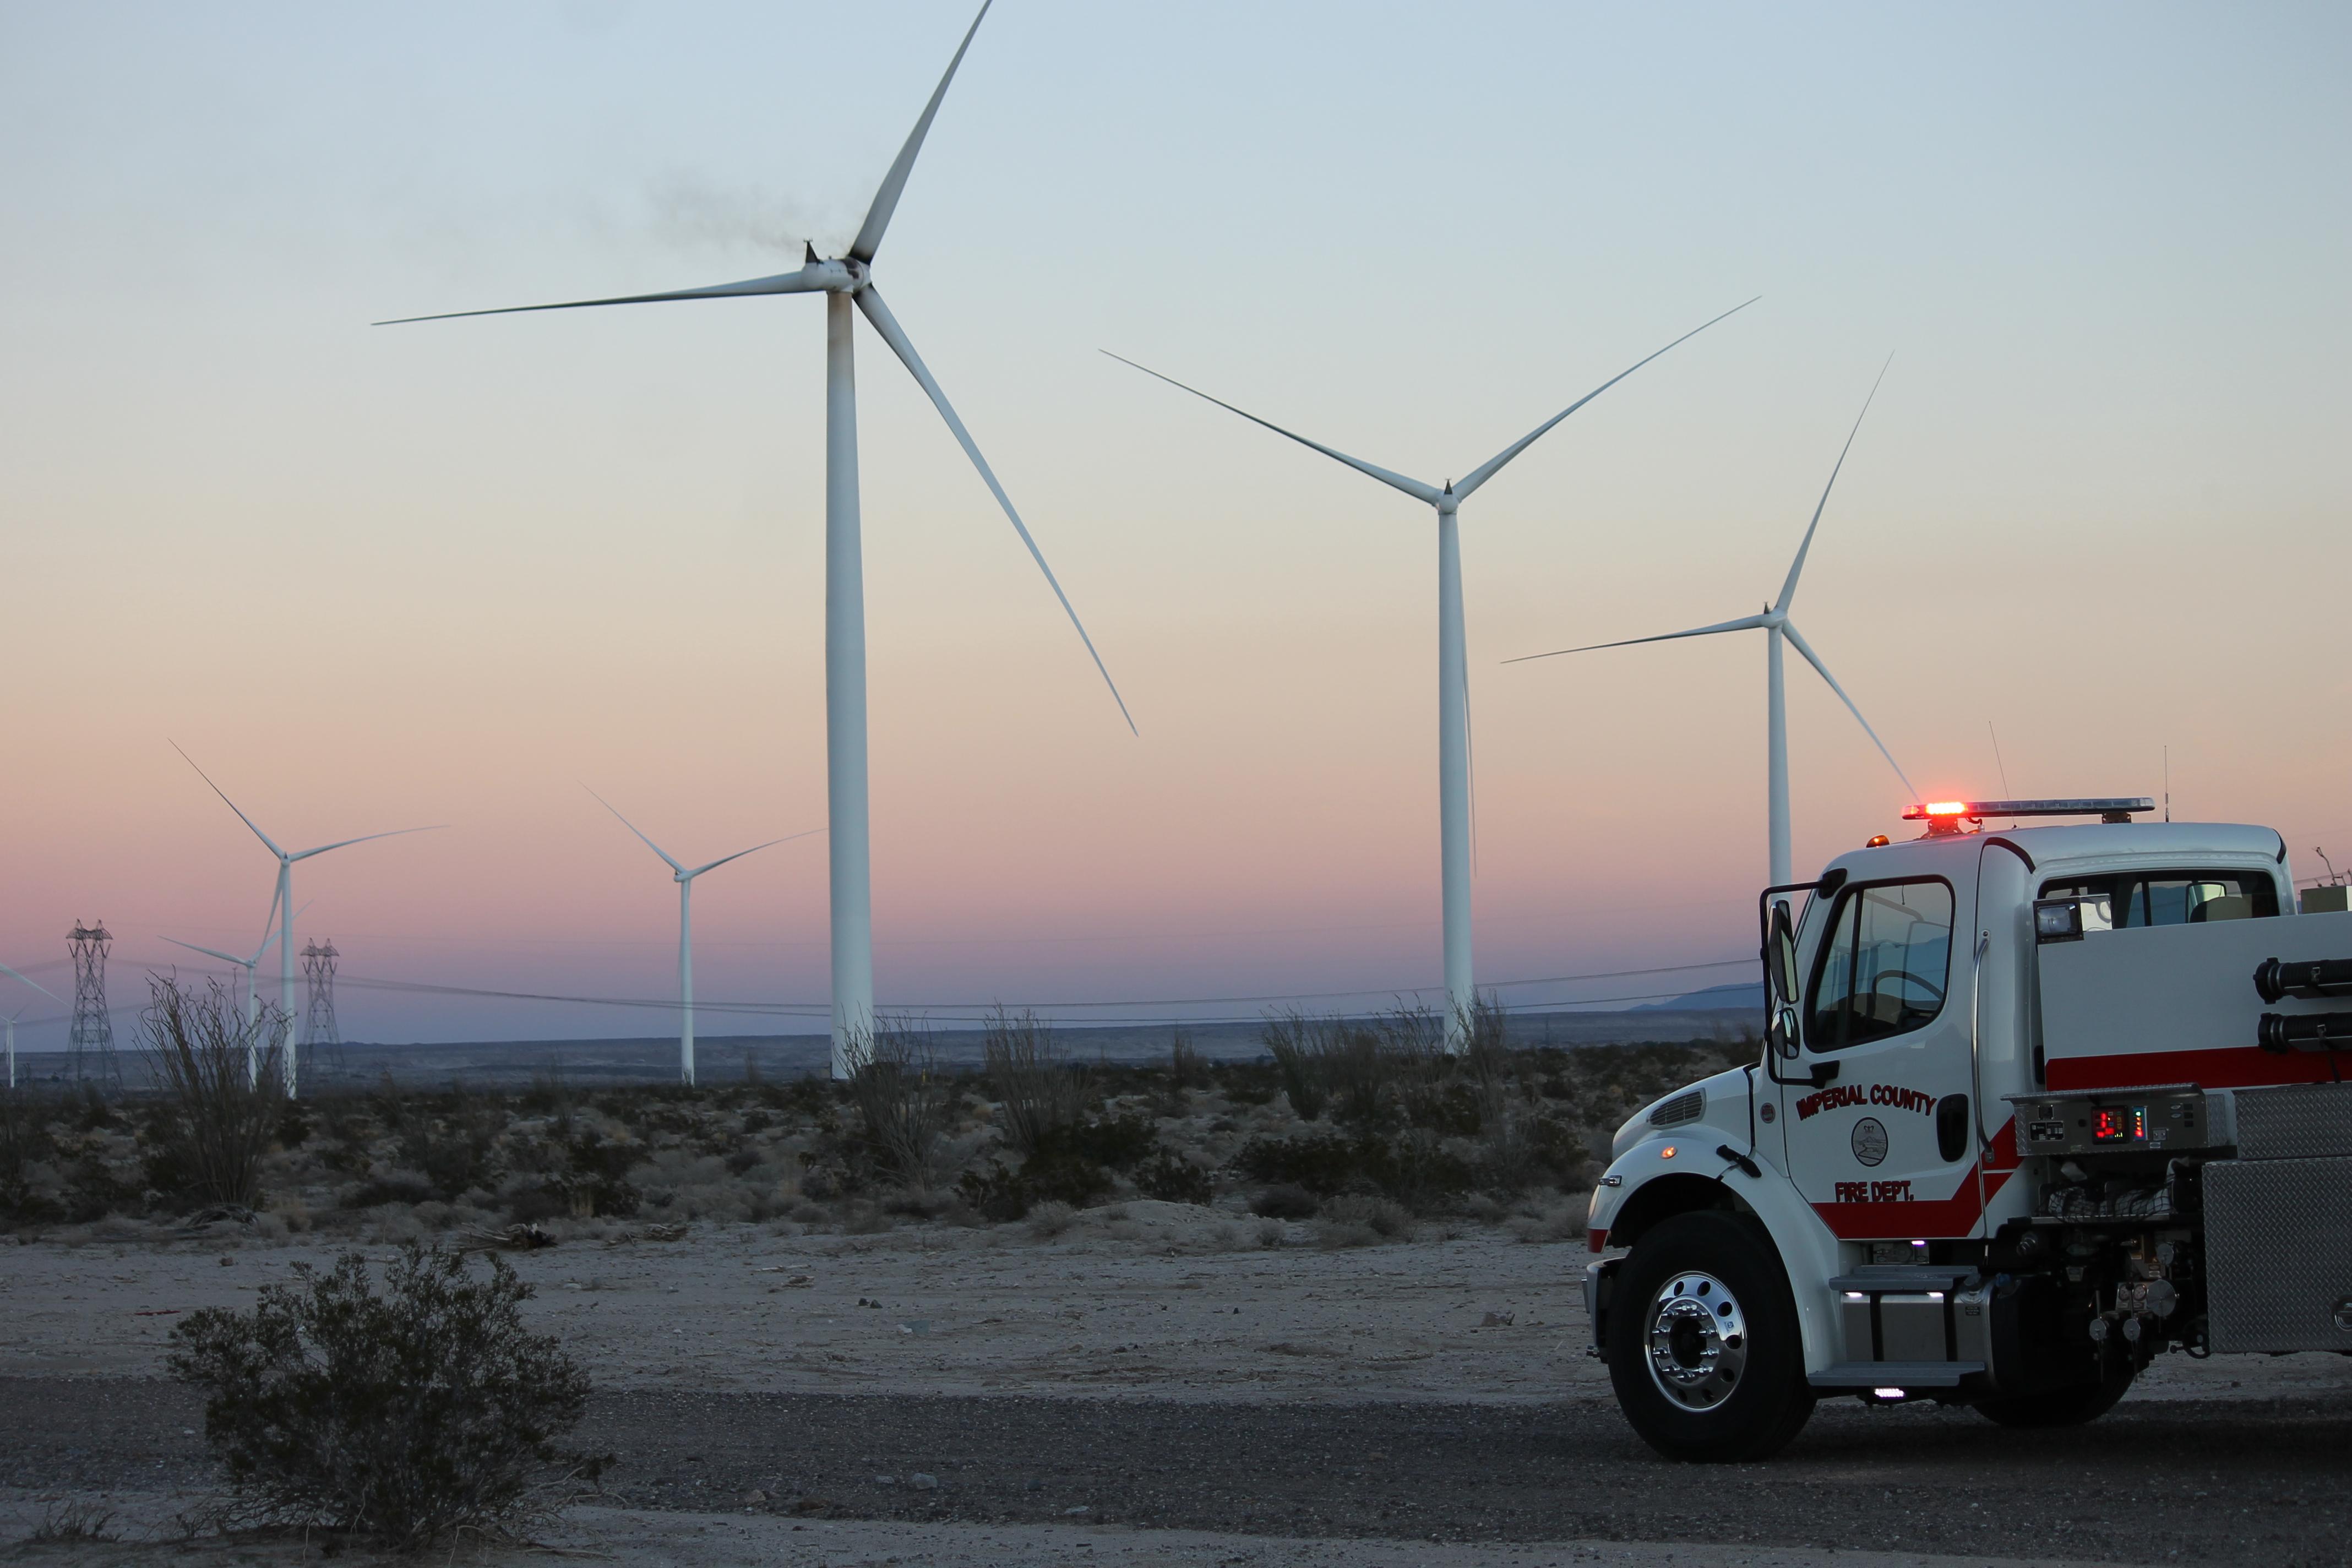 (photo Credit) Fire Truck near WInd turbine #110 fire at Ocotillo by Jim Pelley